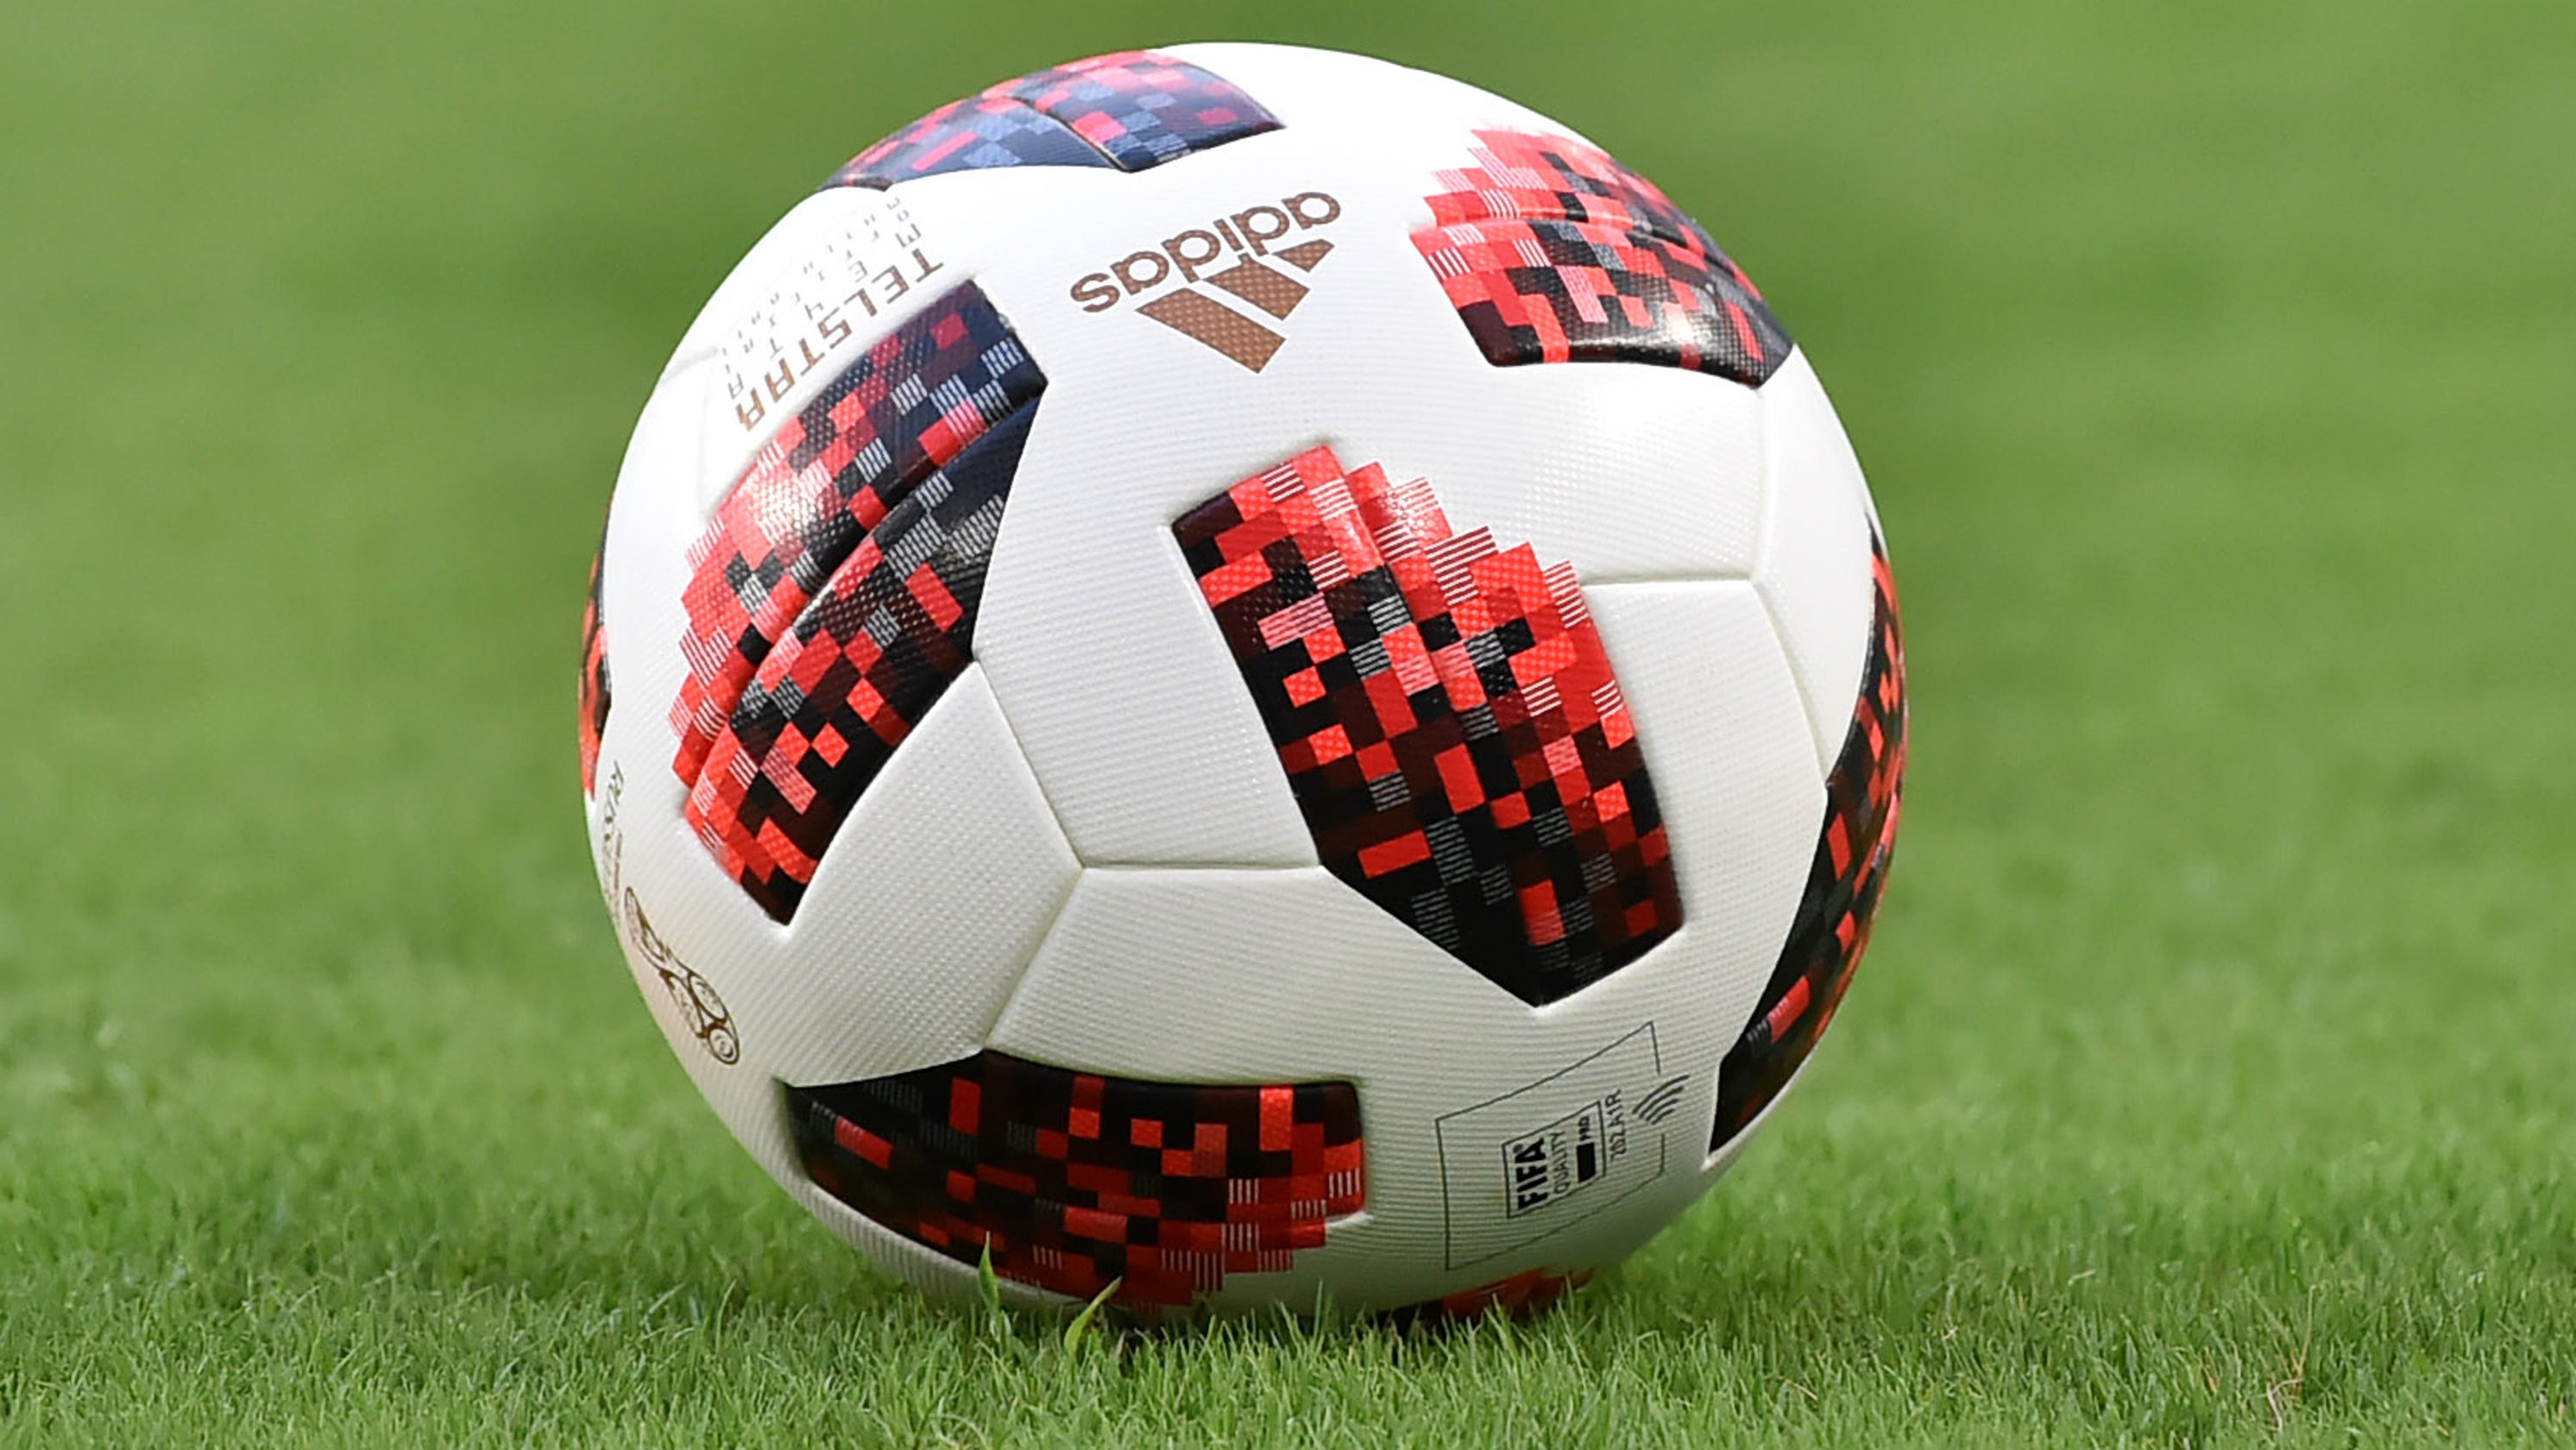 50c592ca-9d91-4f01-9d6c-7cd5a555bf35-usp_soccer__international_friendly_soccer-colombia